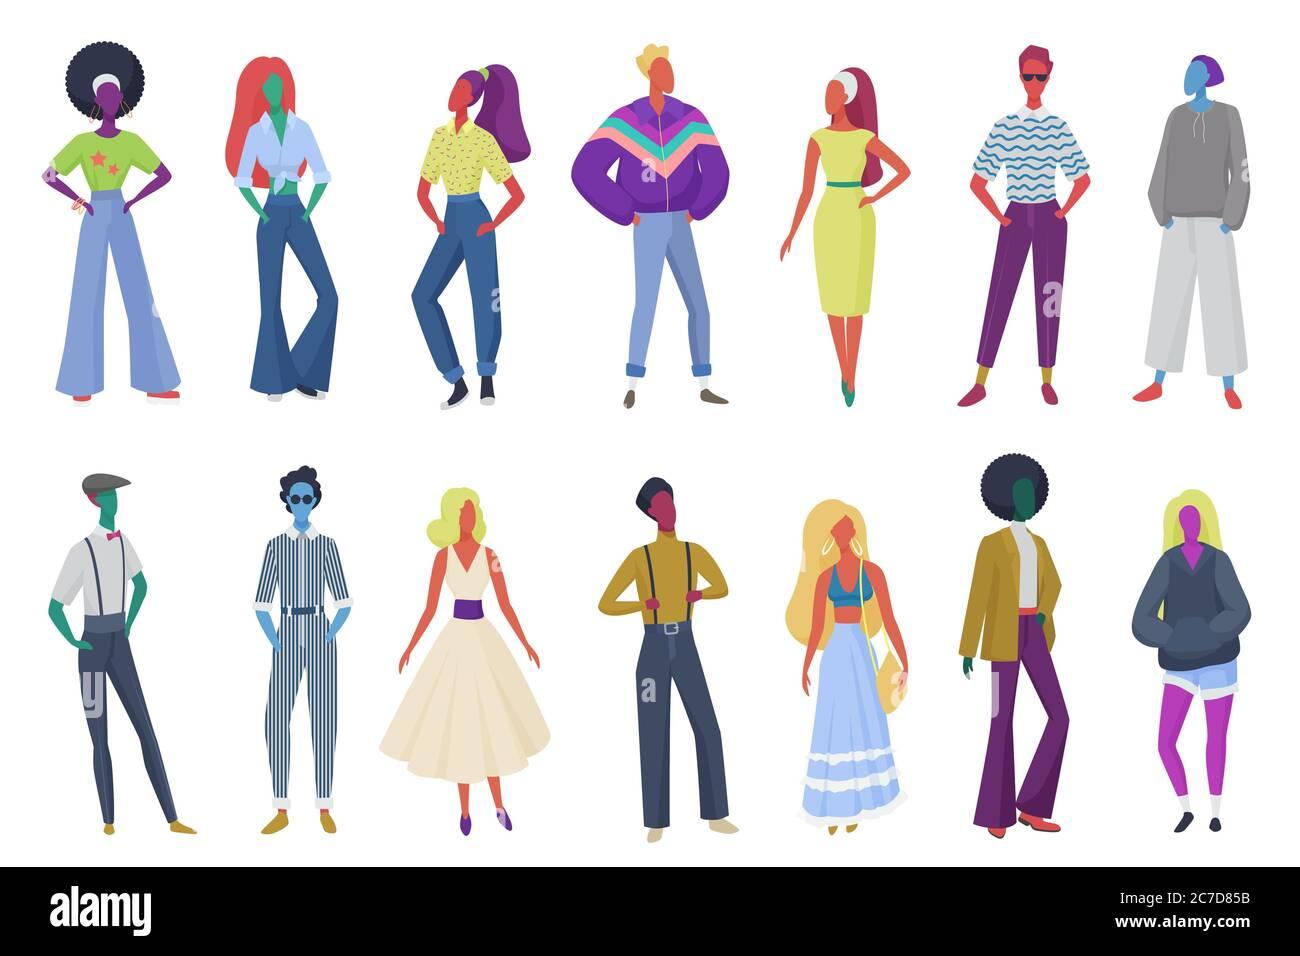 80 code studio dress 70s Disco